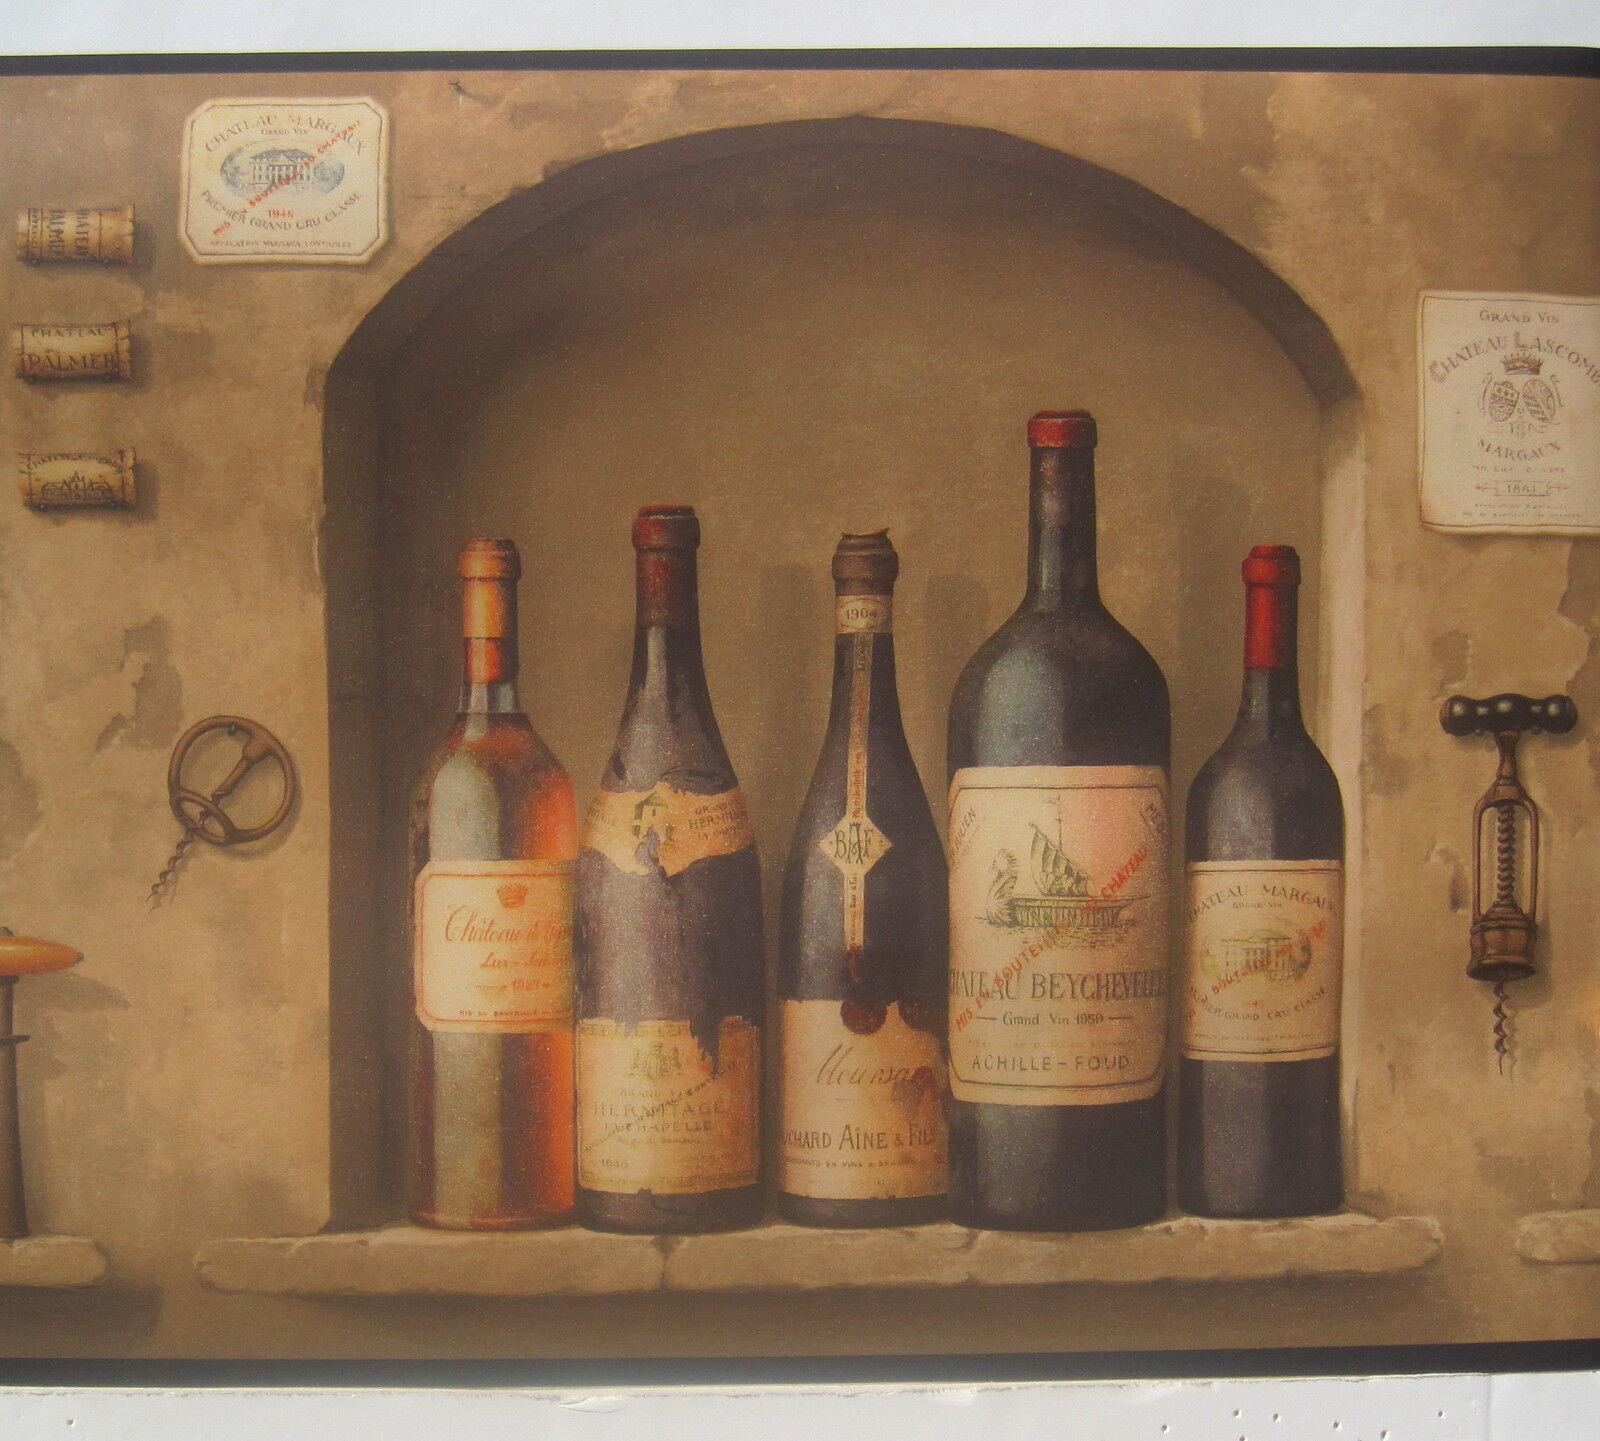 Wine Bottles Bordeaux Burgundy Wine Cellar Wallpaper Borders 10 1/4